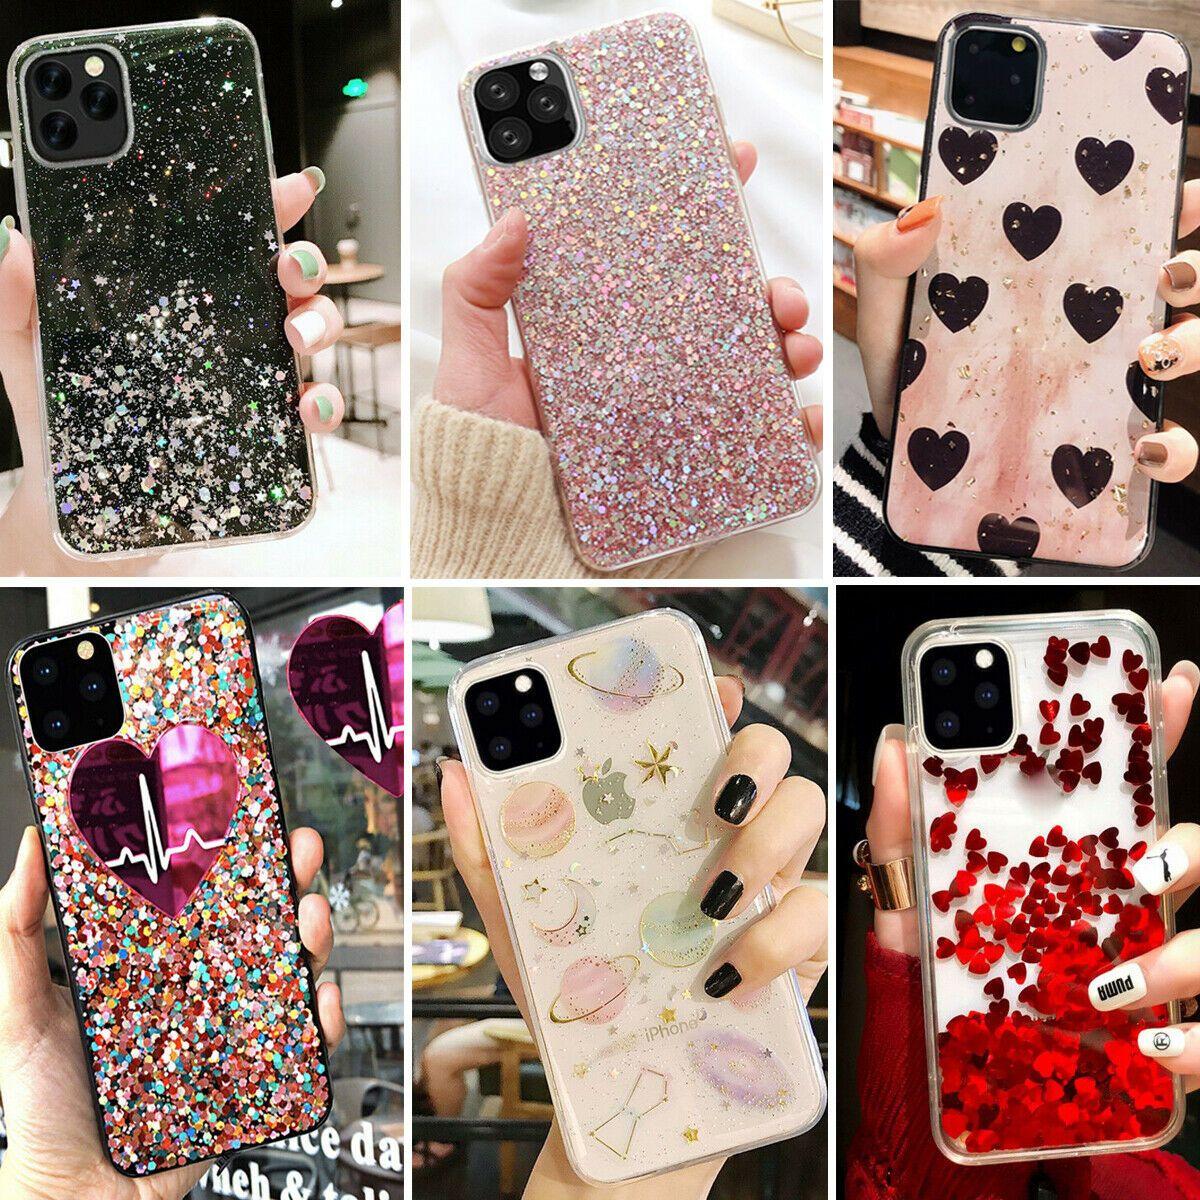 F Iphone 11 Pro Max 8 Plus 7 Xs Max Xr Cute Bling Glitter Girls Women Case Cover Sparkle Phone Case Glitter Iphone 6 Case Black Iphone Cases